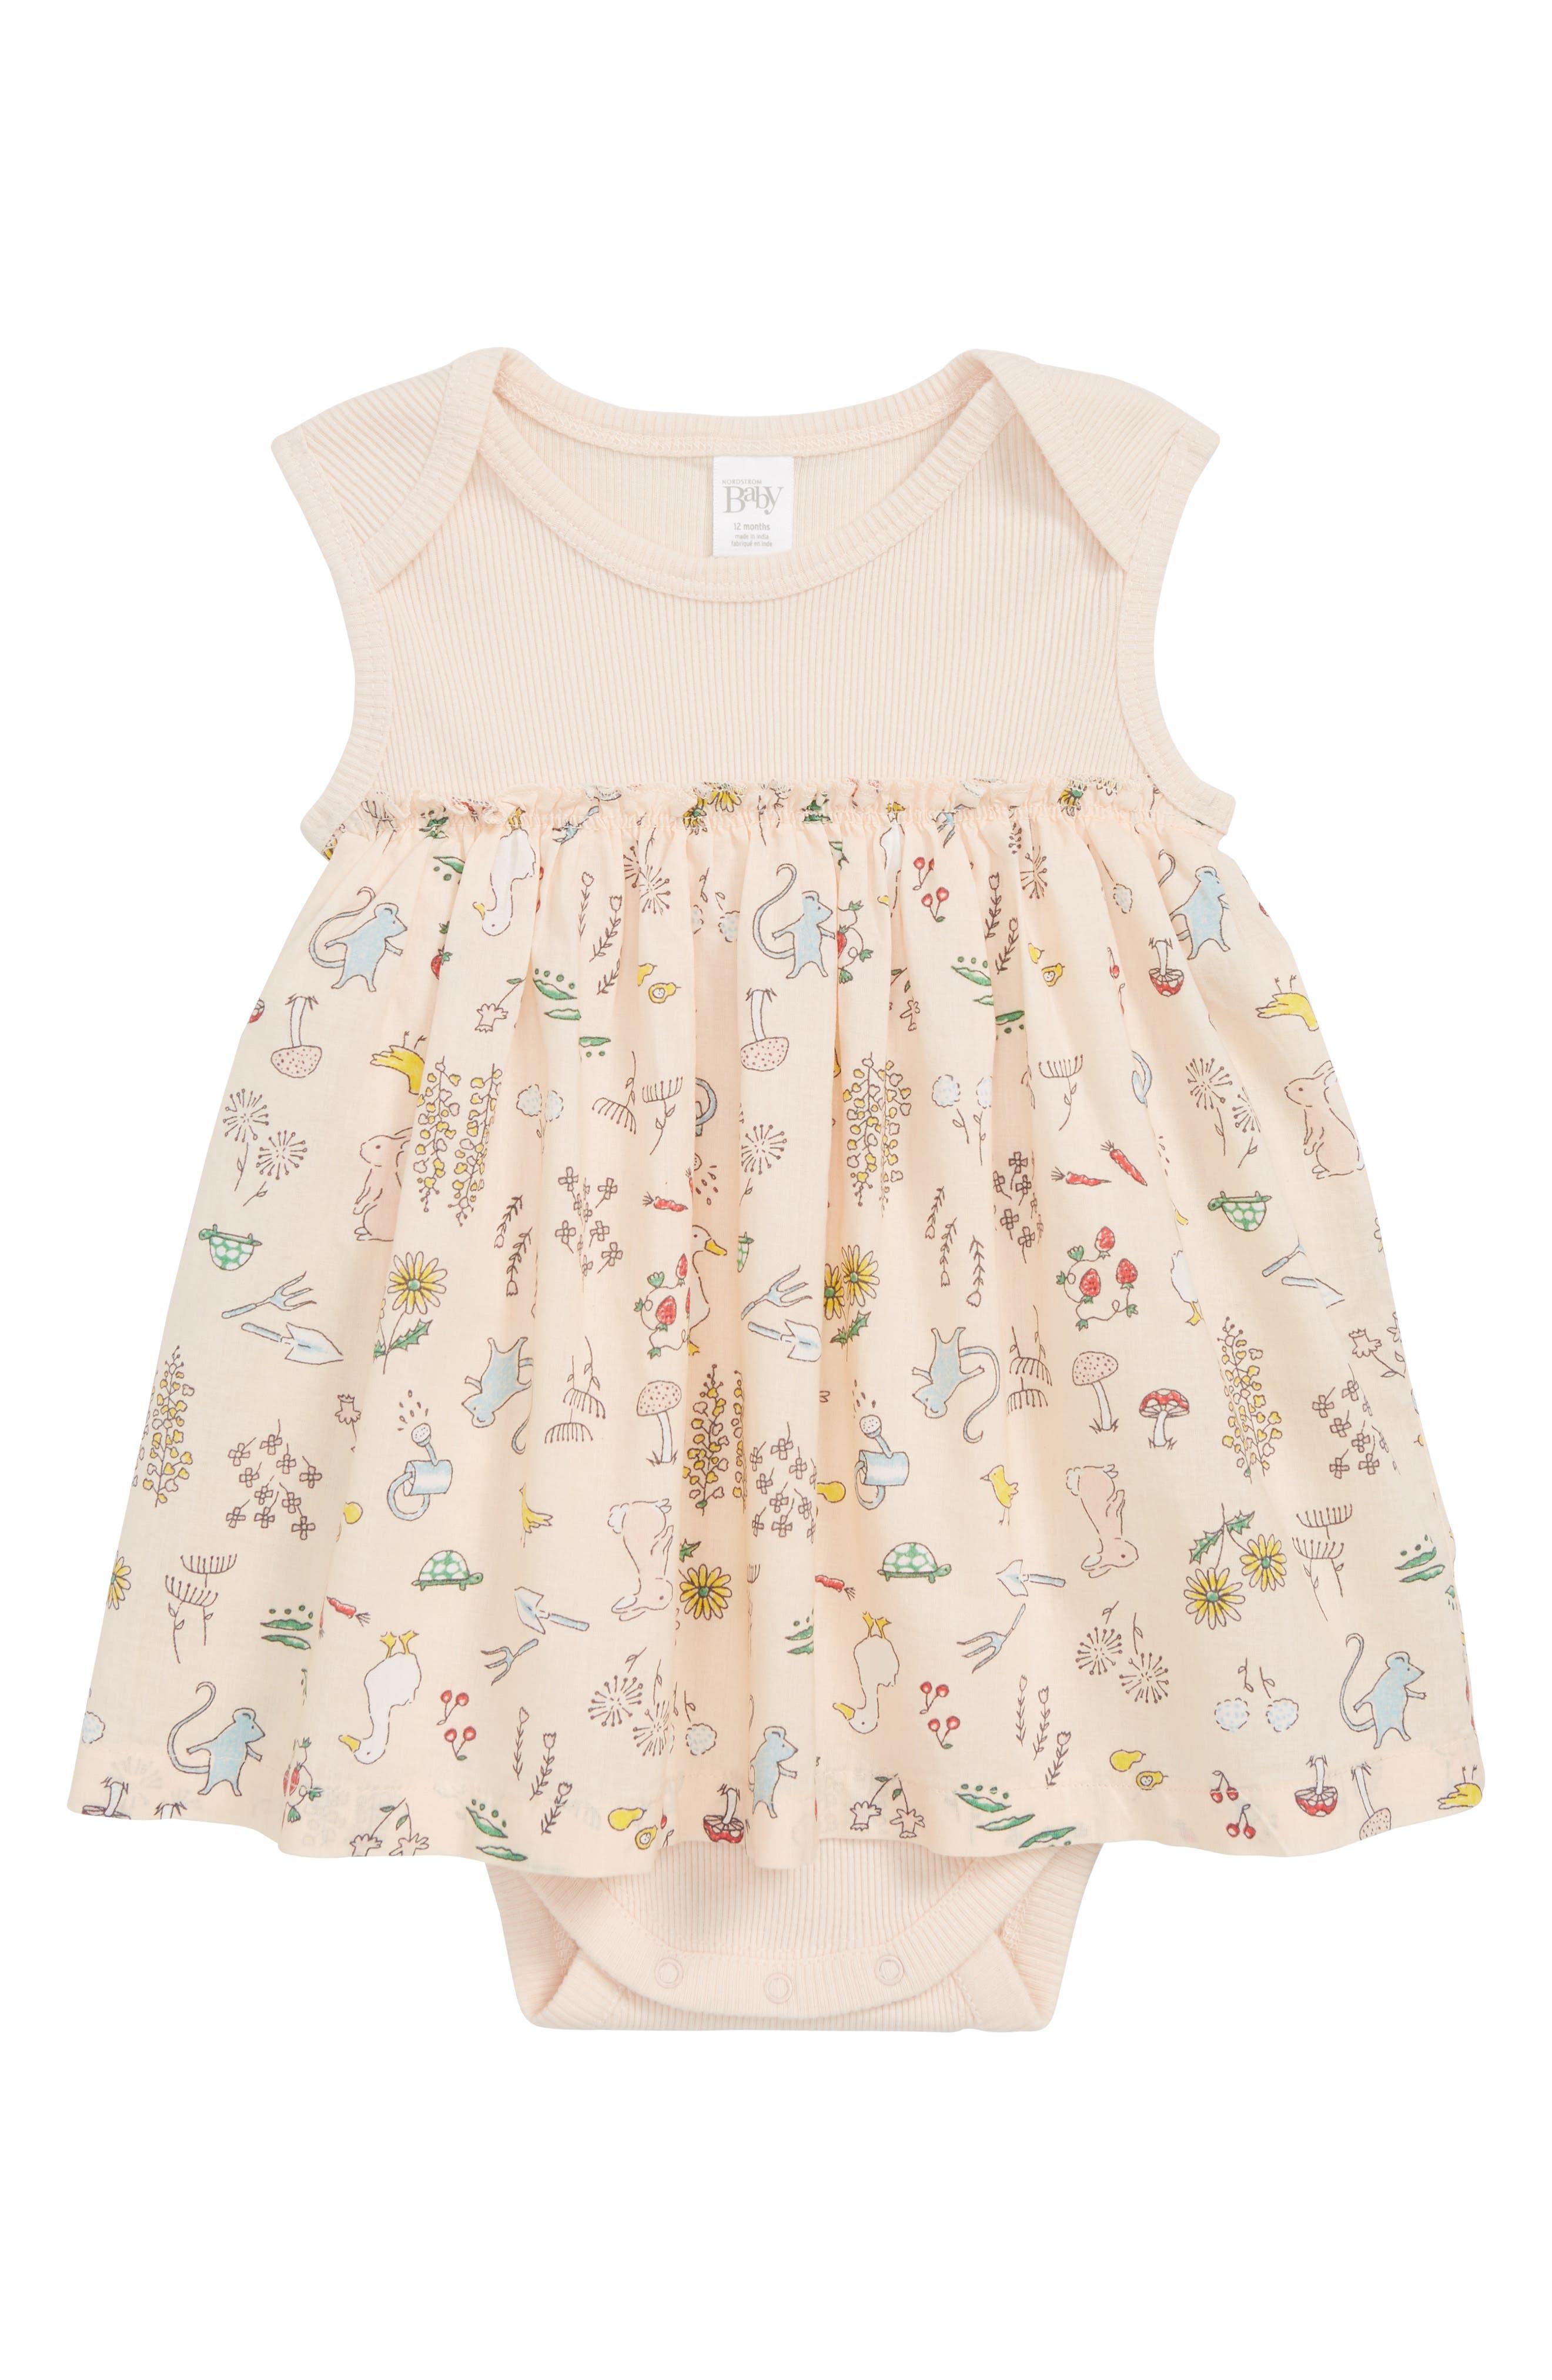 NORDSTROM BABY,                             Bodysuit Dress,                             Main thumbnail 1, color,                             680